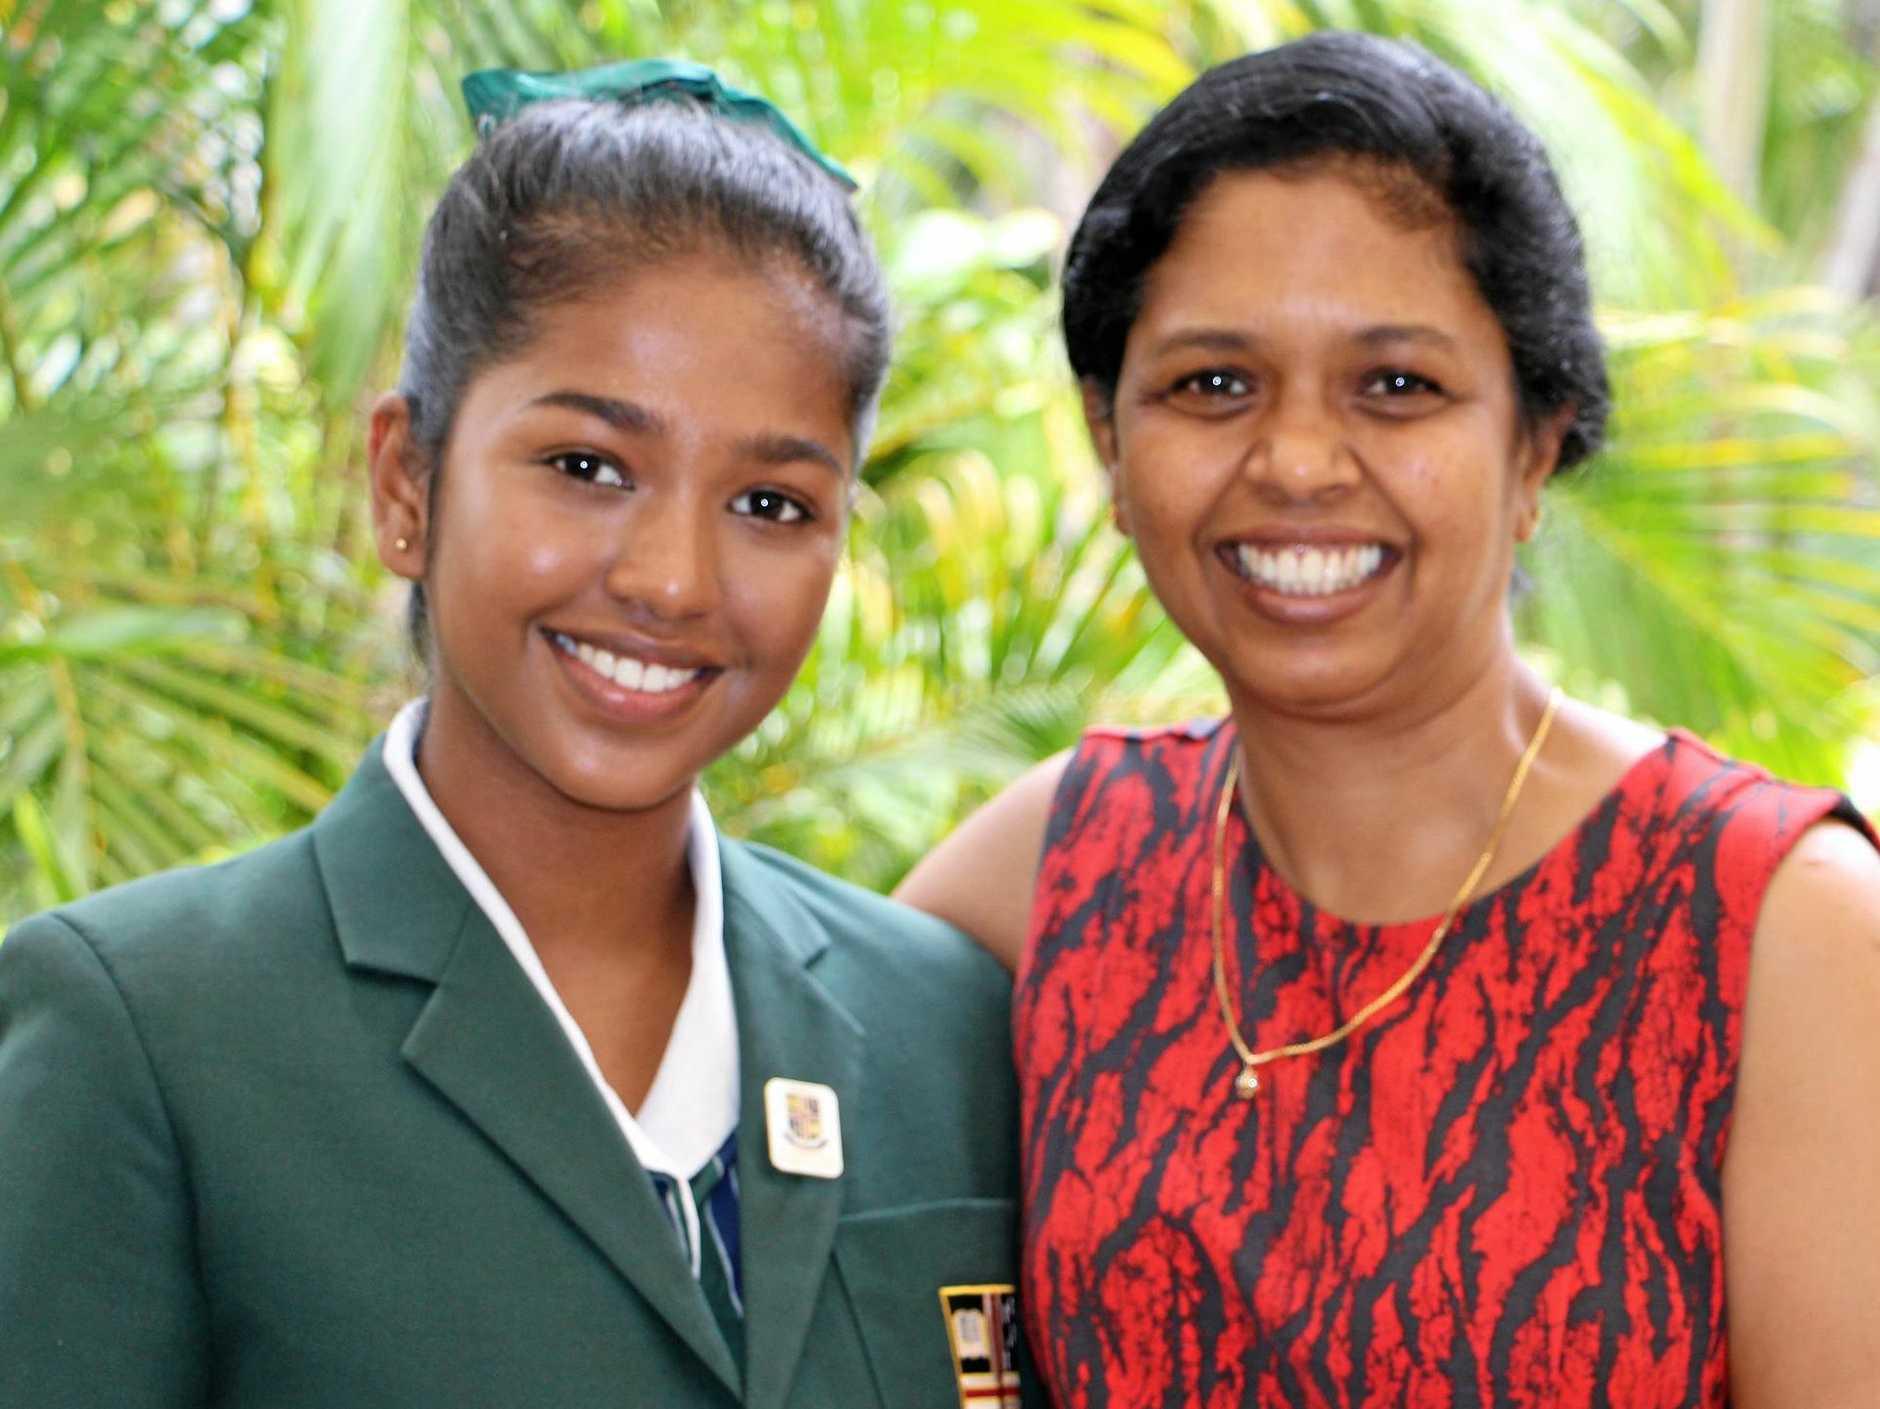 Tharushi Abeyratne, Sunshine Coast Grammar School Dux and OP1 recipient with her proud mother.